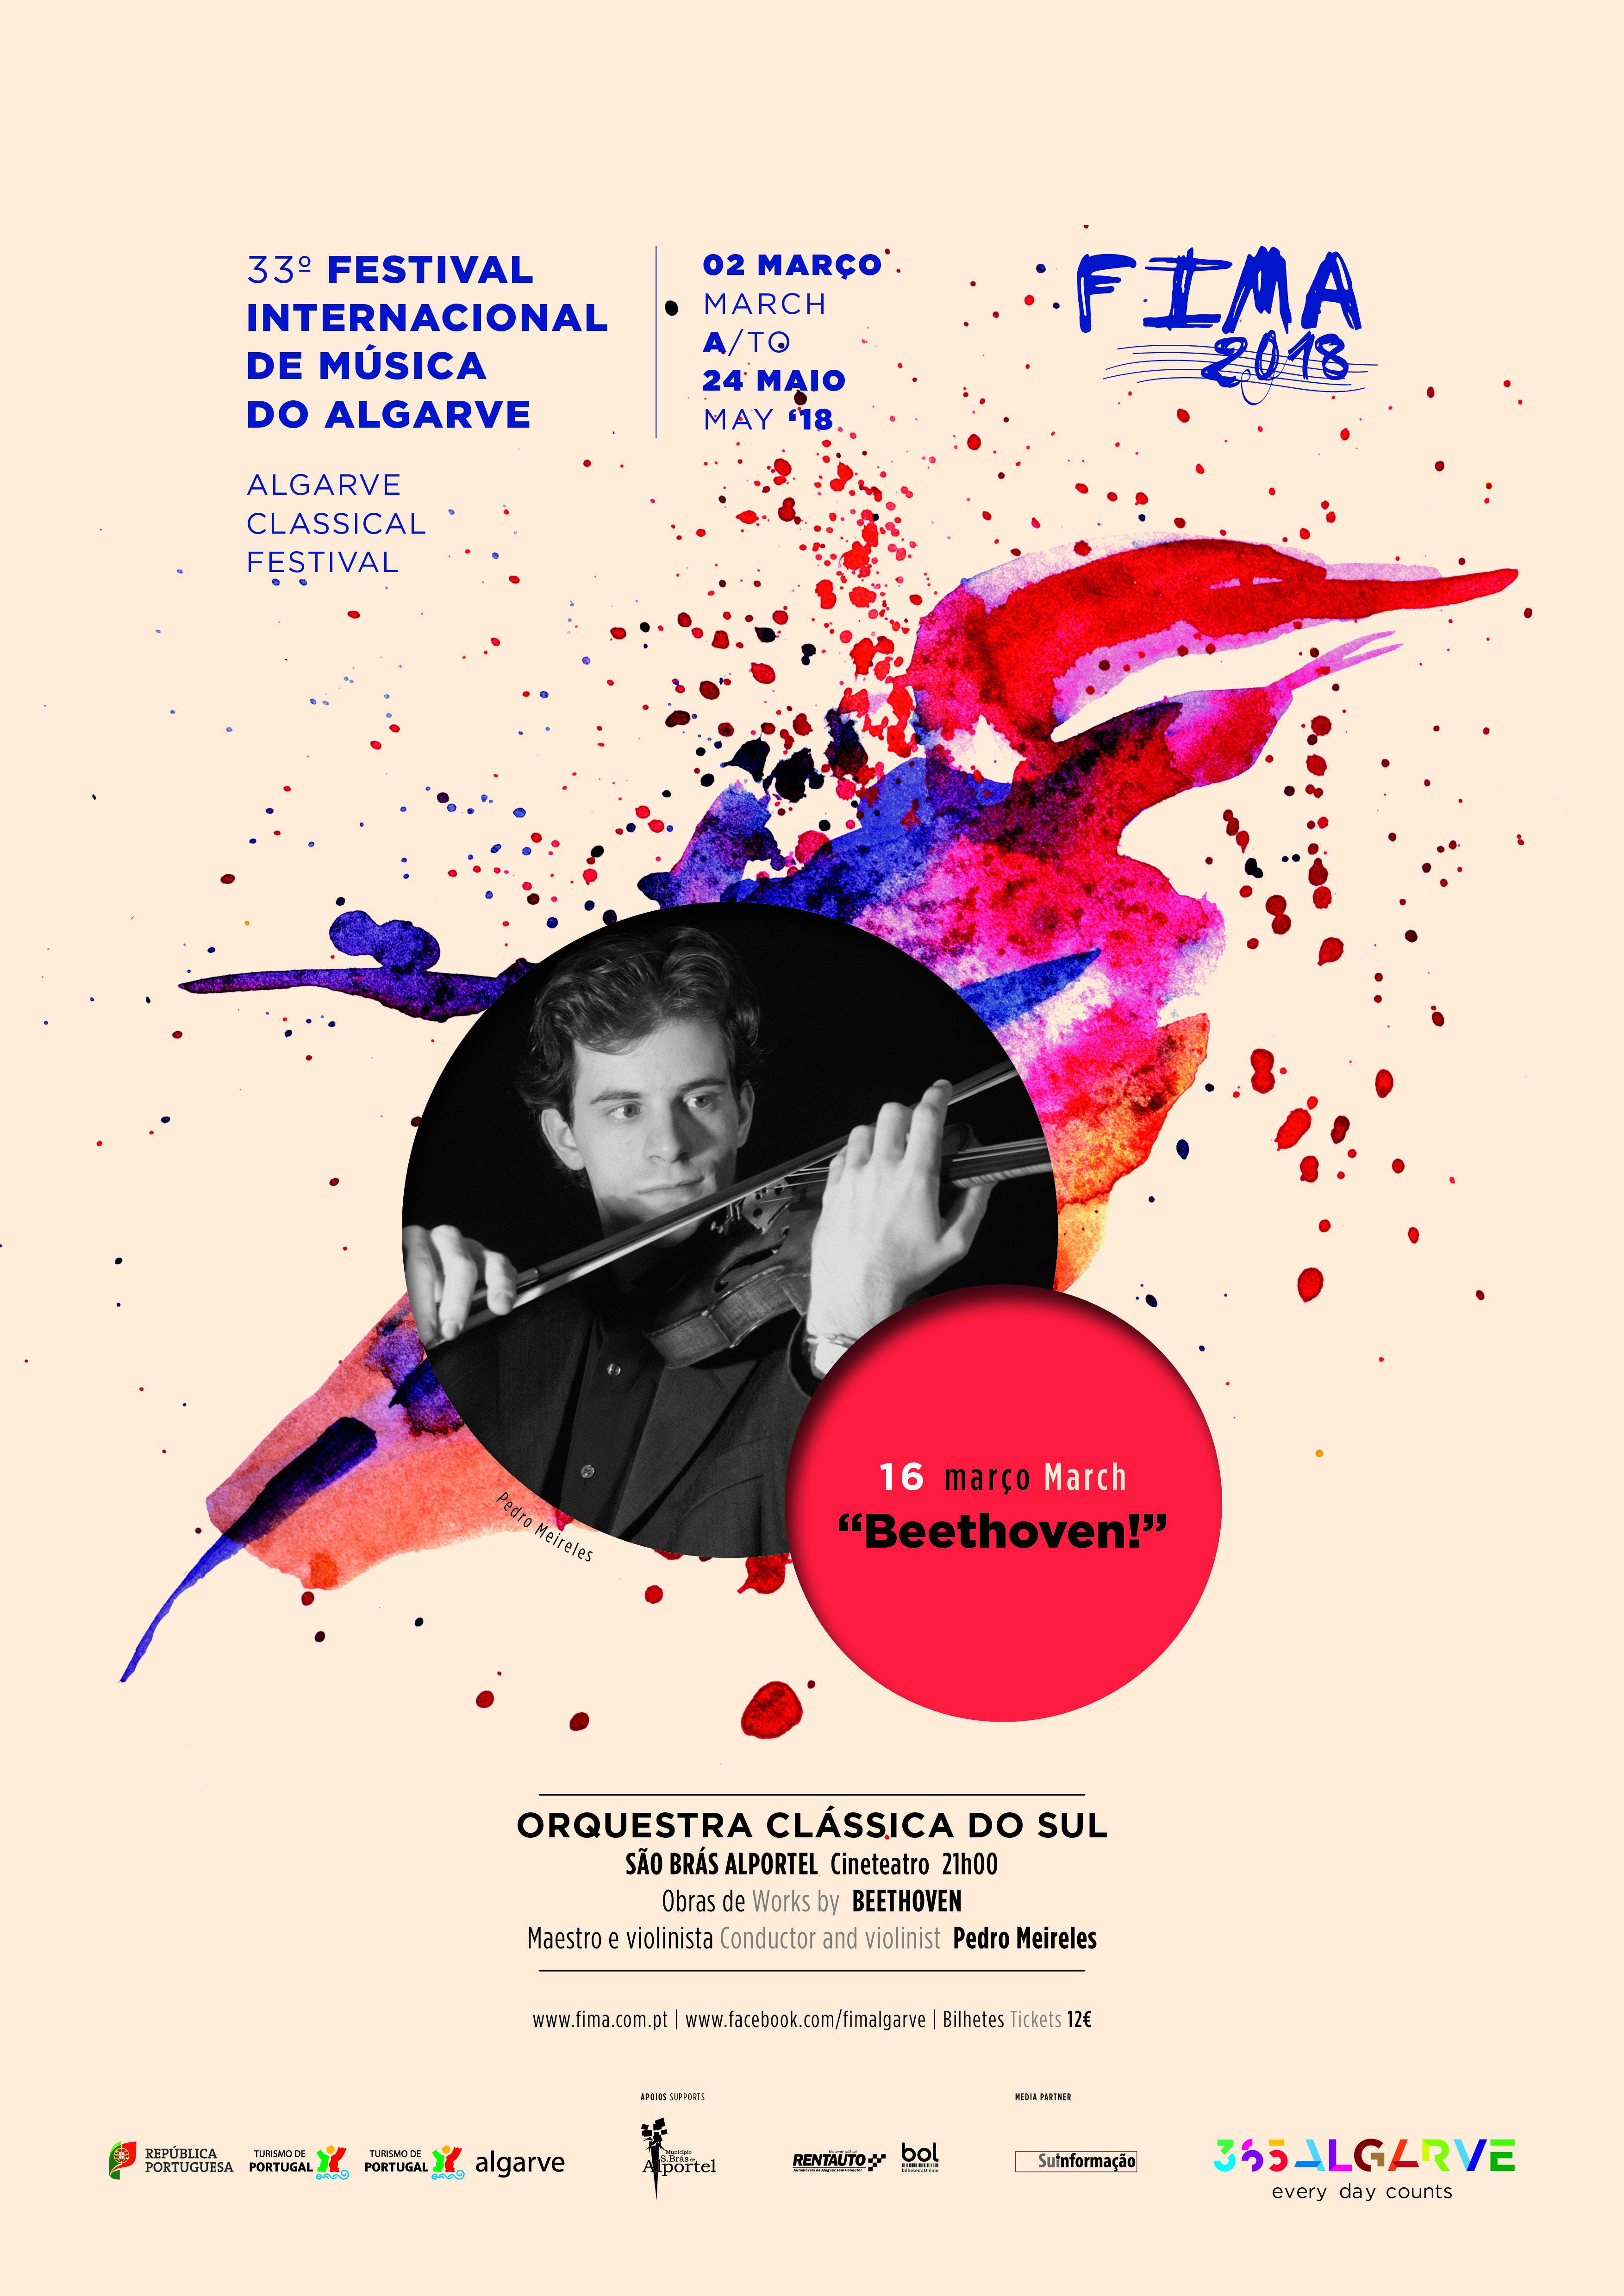 cartaz FIMA 2018 - concerto beethoven